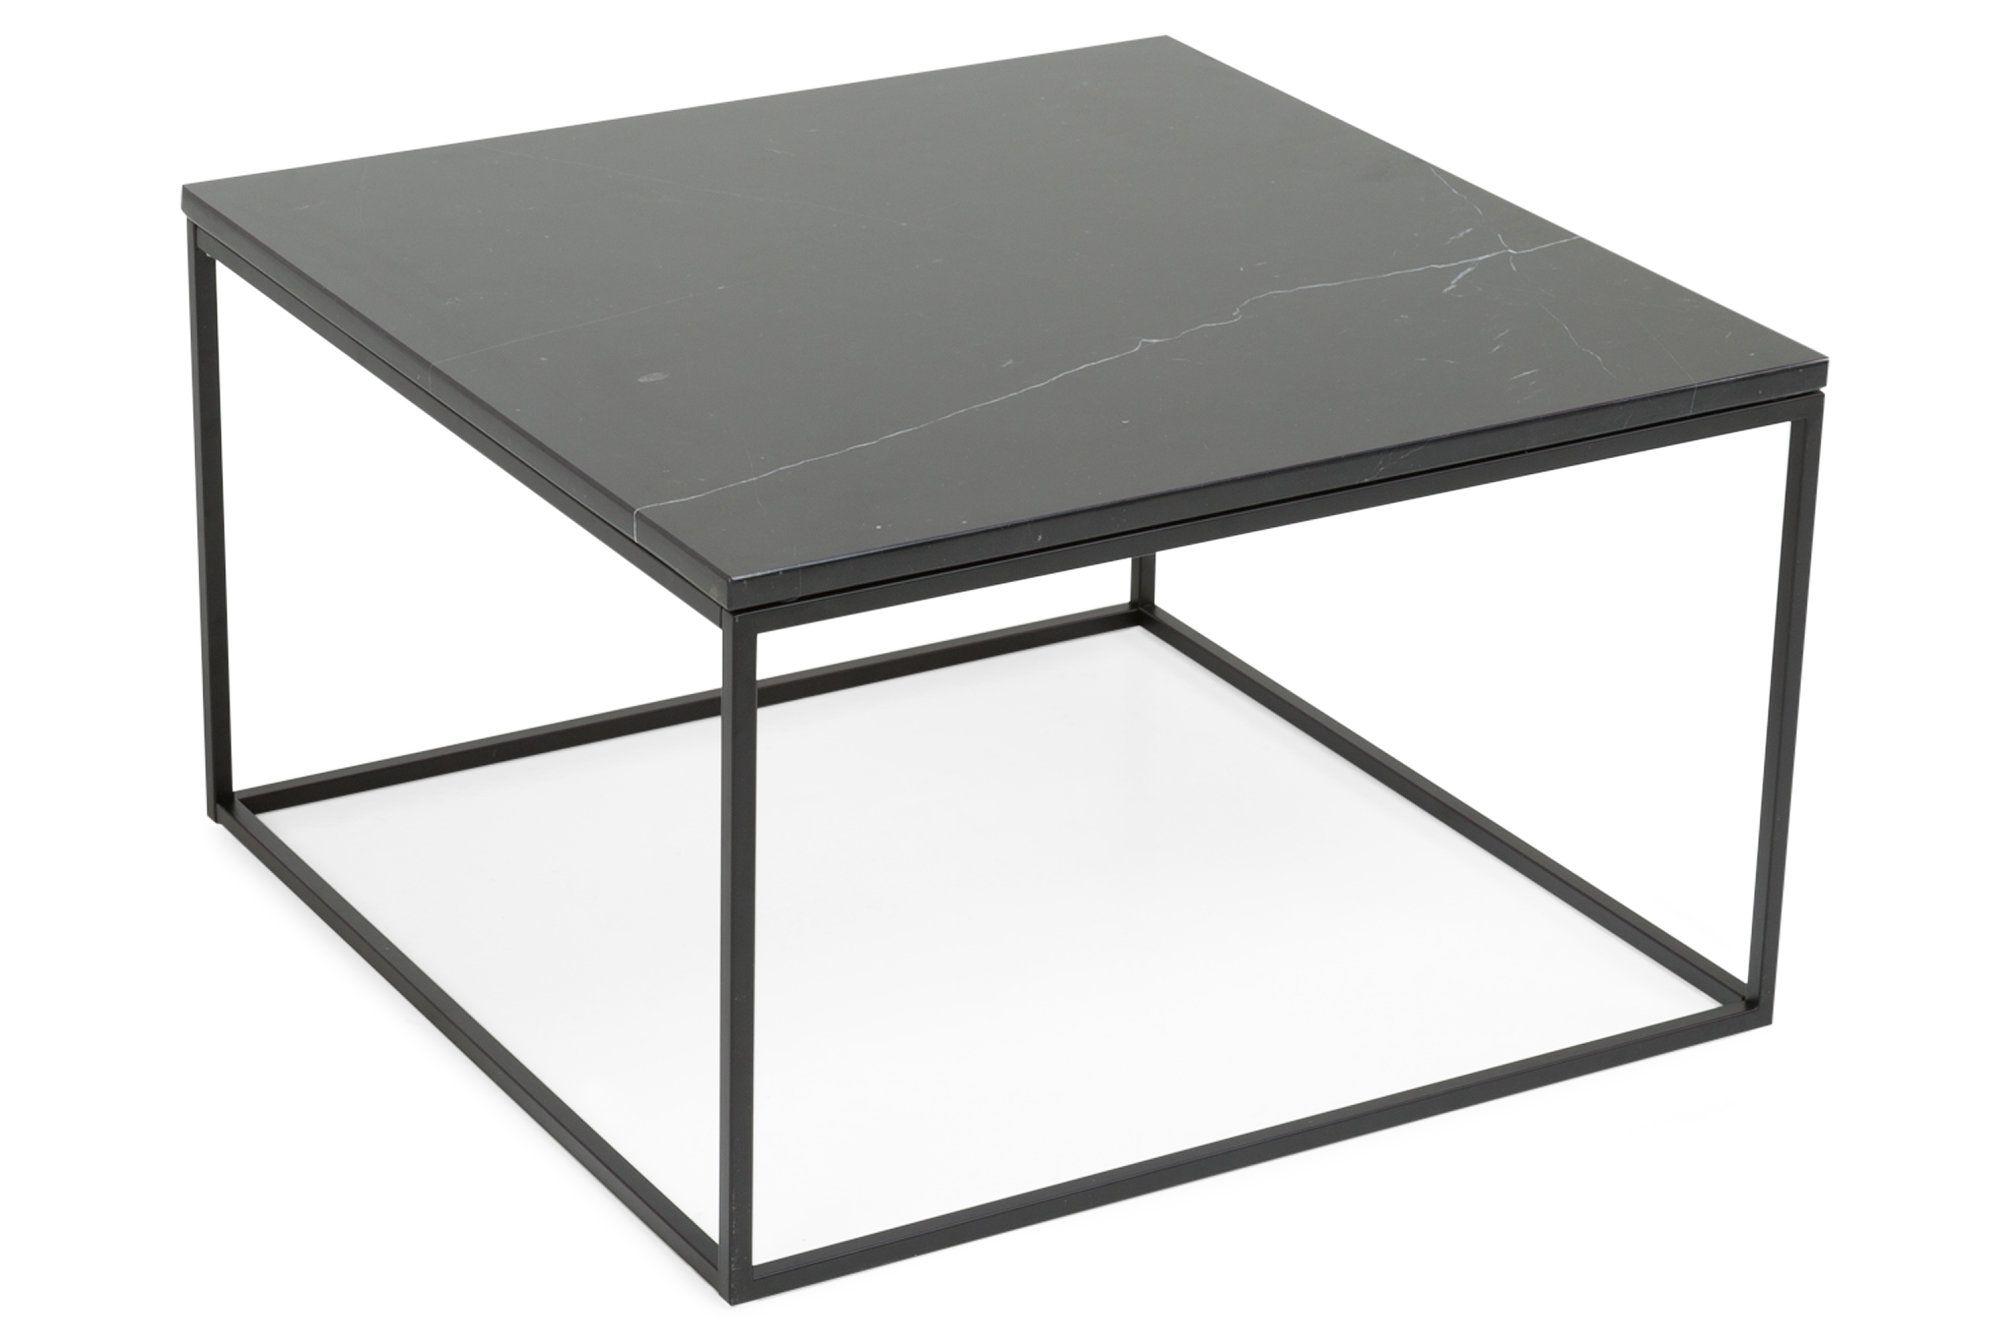 Carrie Soffbord 75 cm Marmor in 2019 Vill ha Inredning Furniture, Table, D